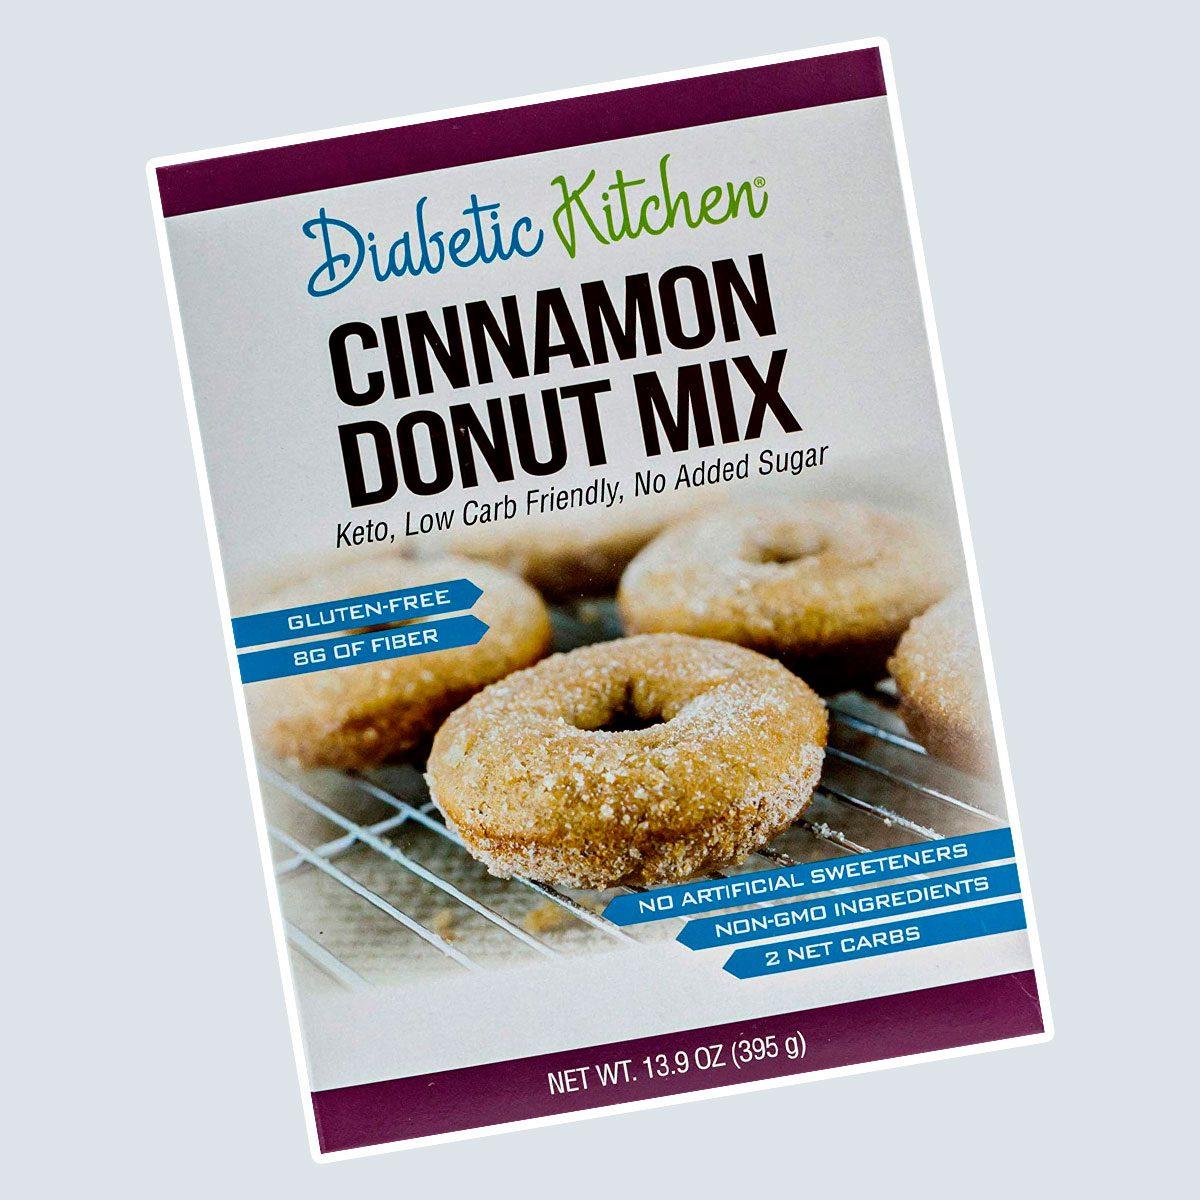 Diabetic Kitchen Cinnamon Donut Mix